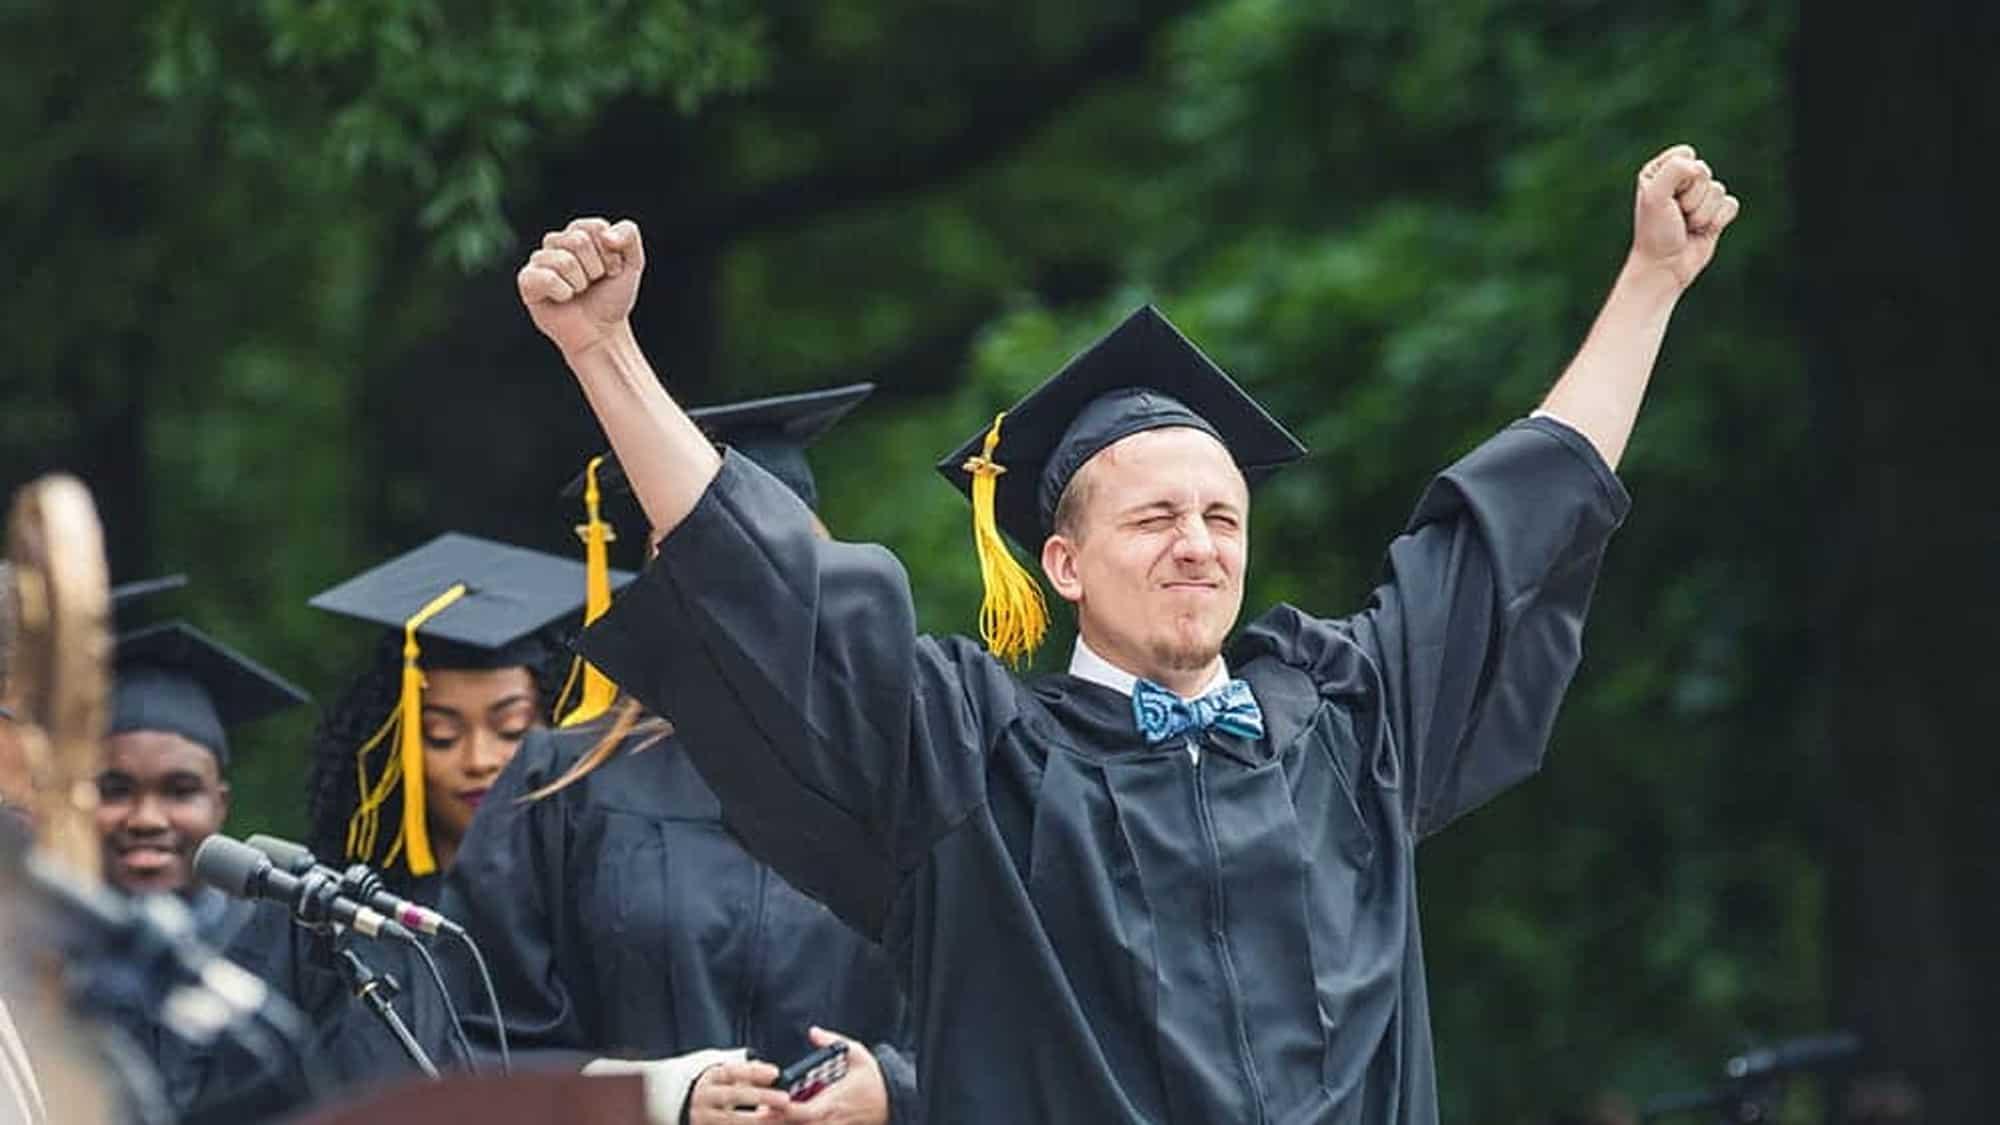 Graduates of Regent, a university that offers a fast-track nursing pilot.